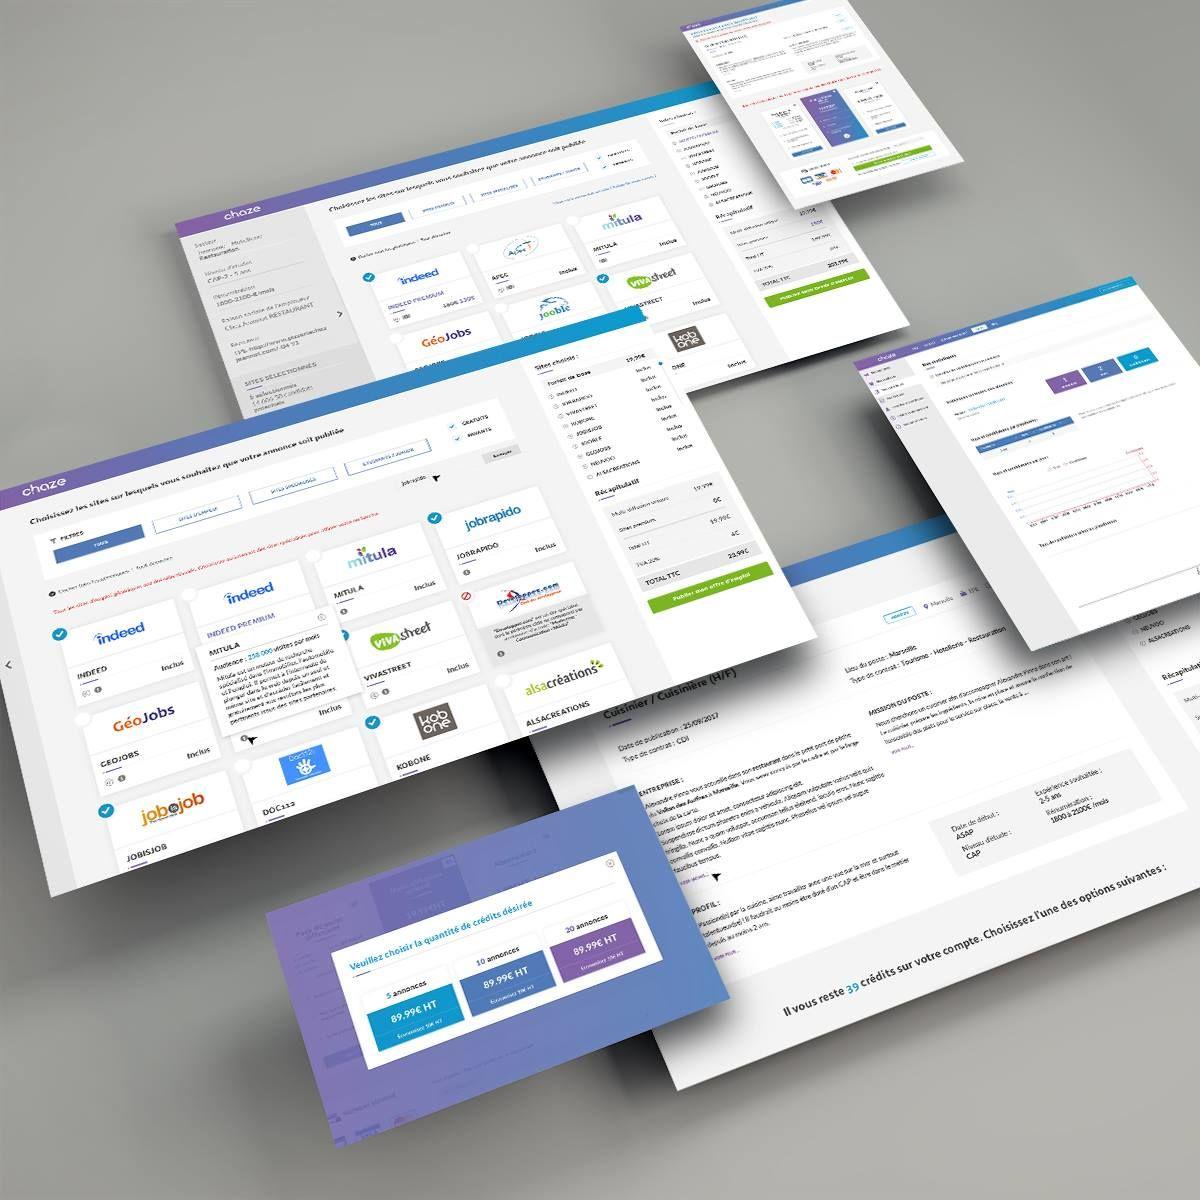 Interfaces design - Chaze